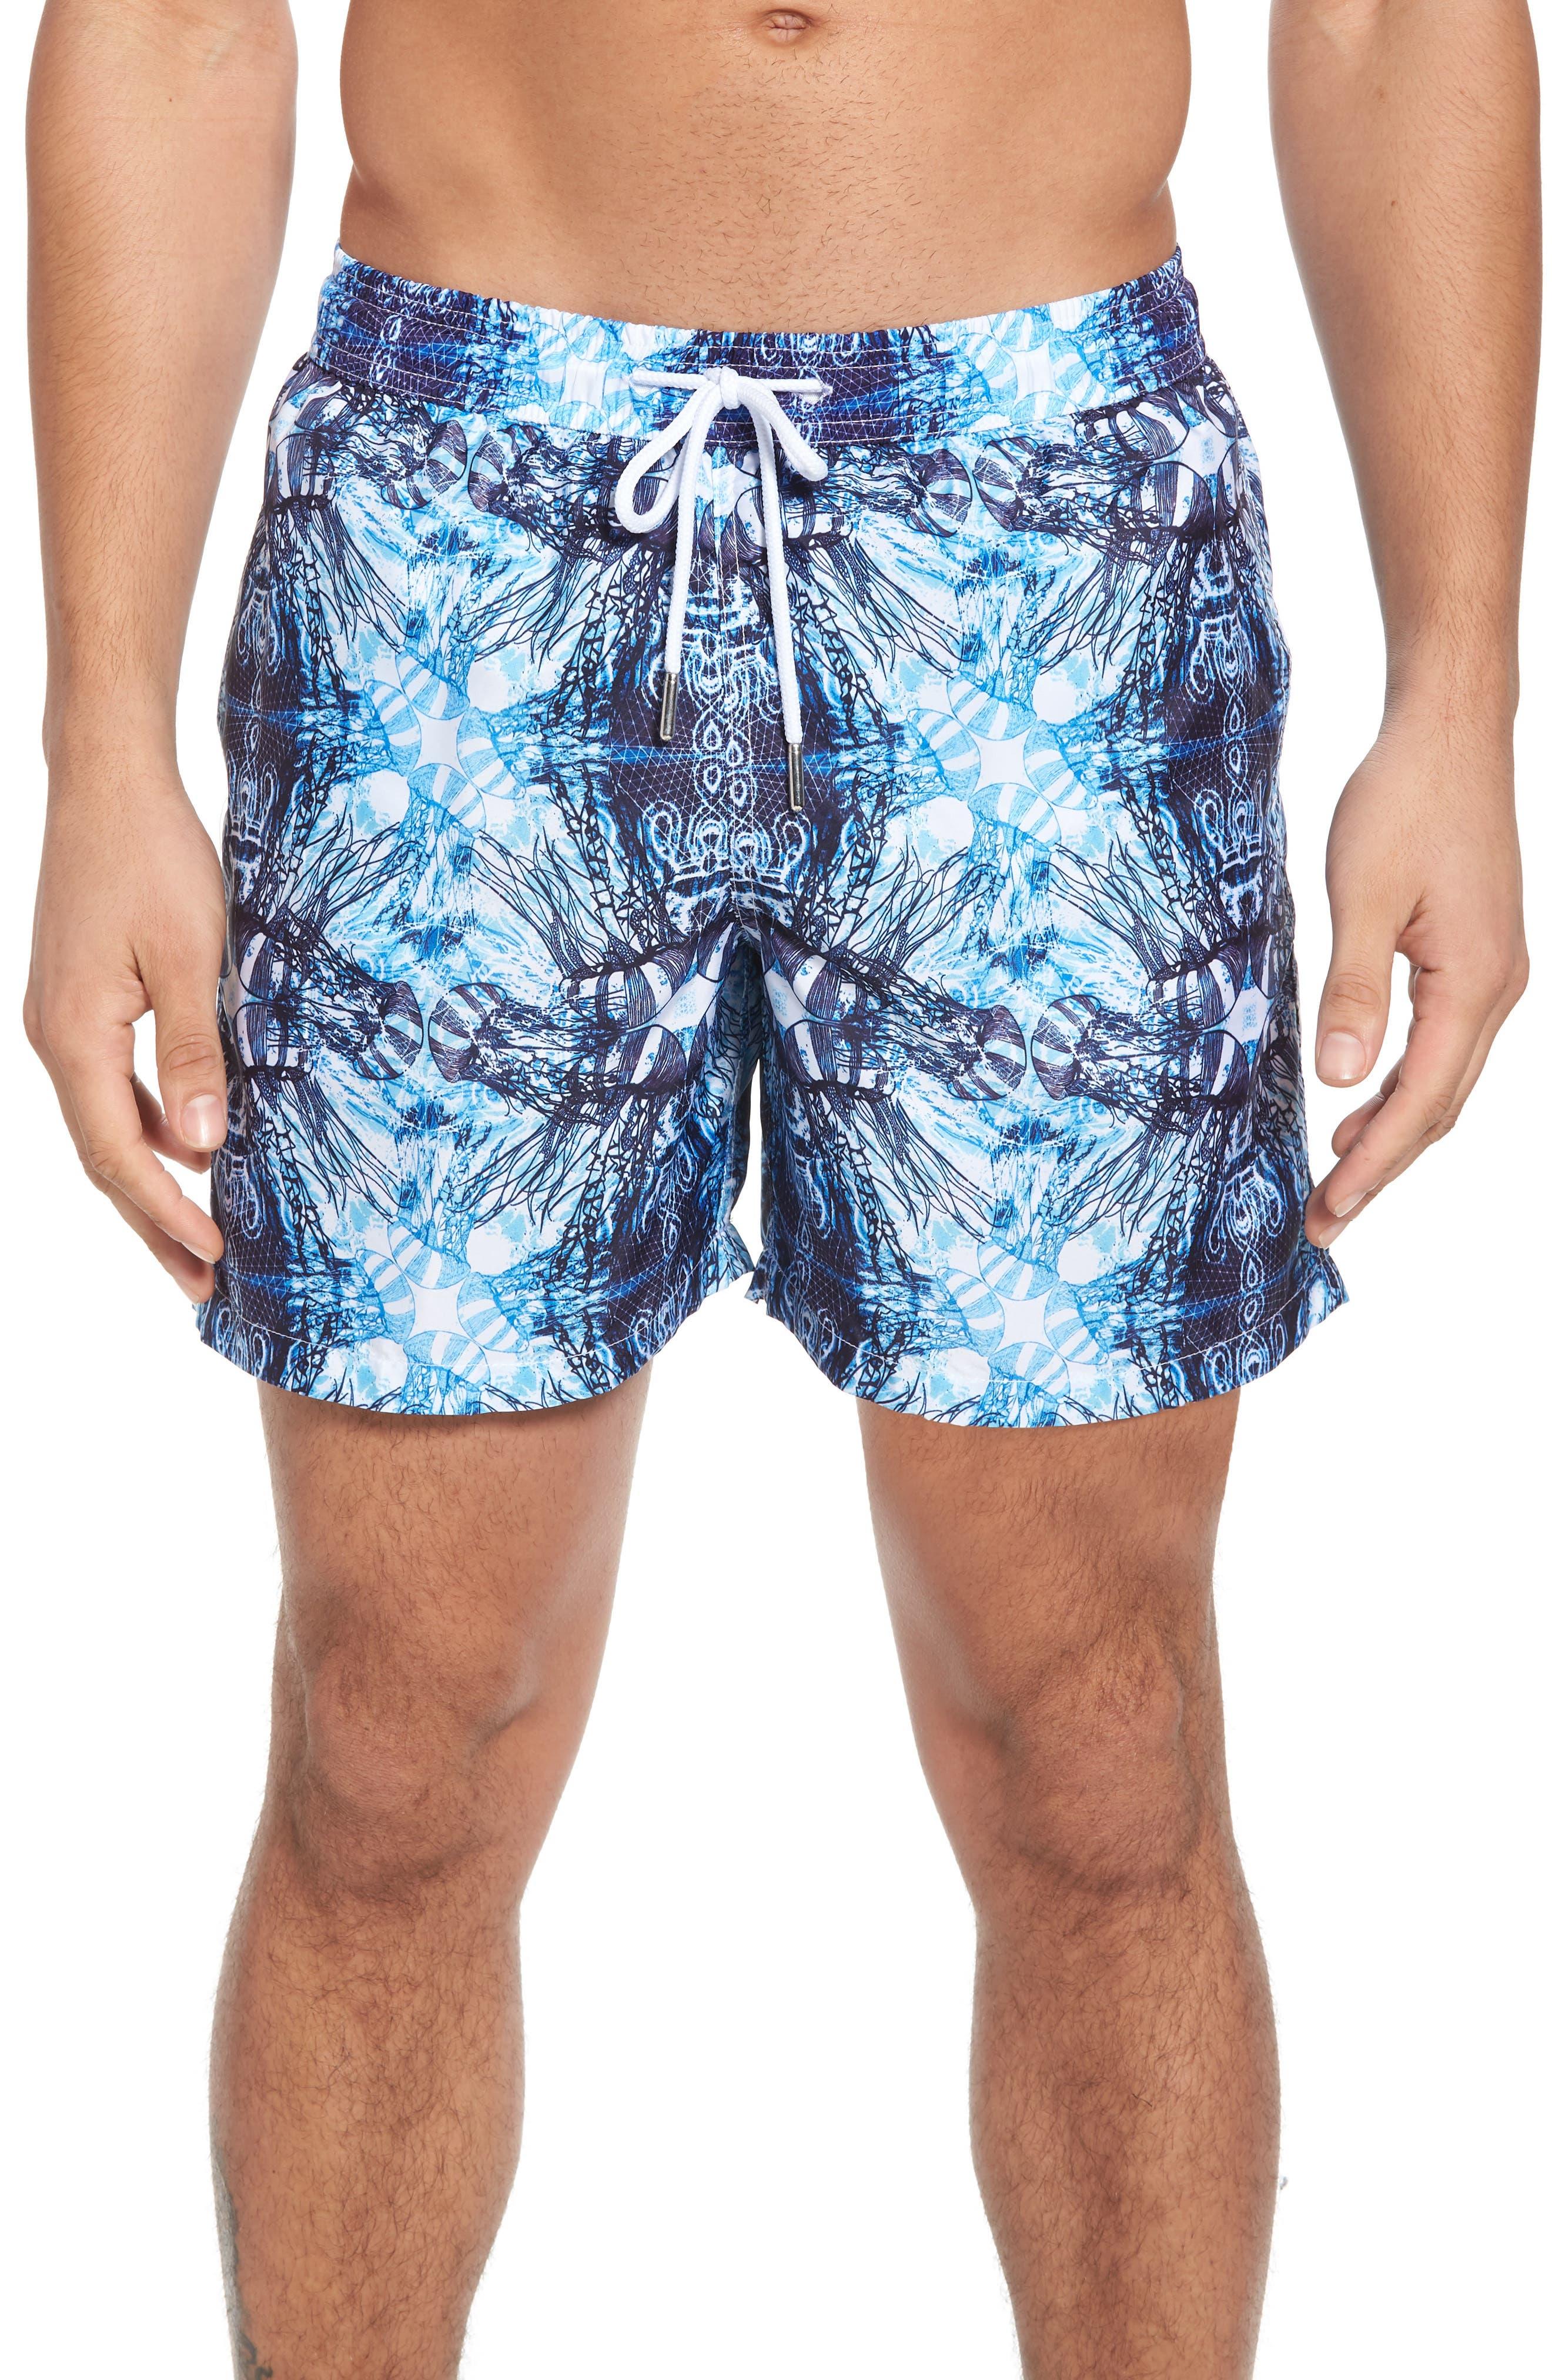 Trim Fit Swim Shorts,                         Main,                         color, Light Blue Jelly Fish